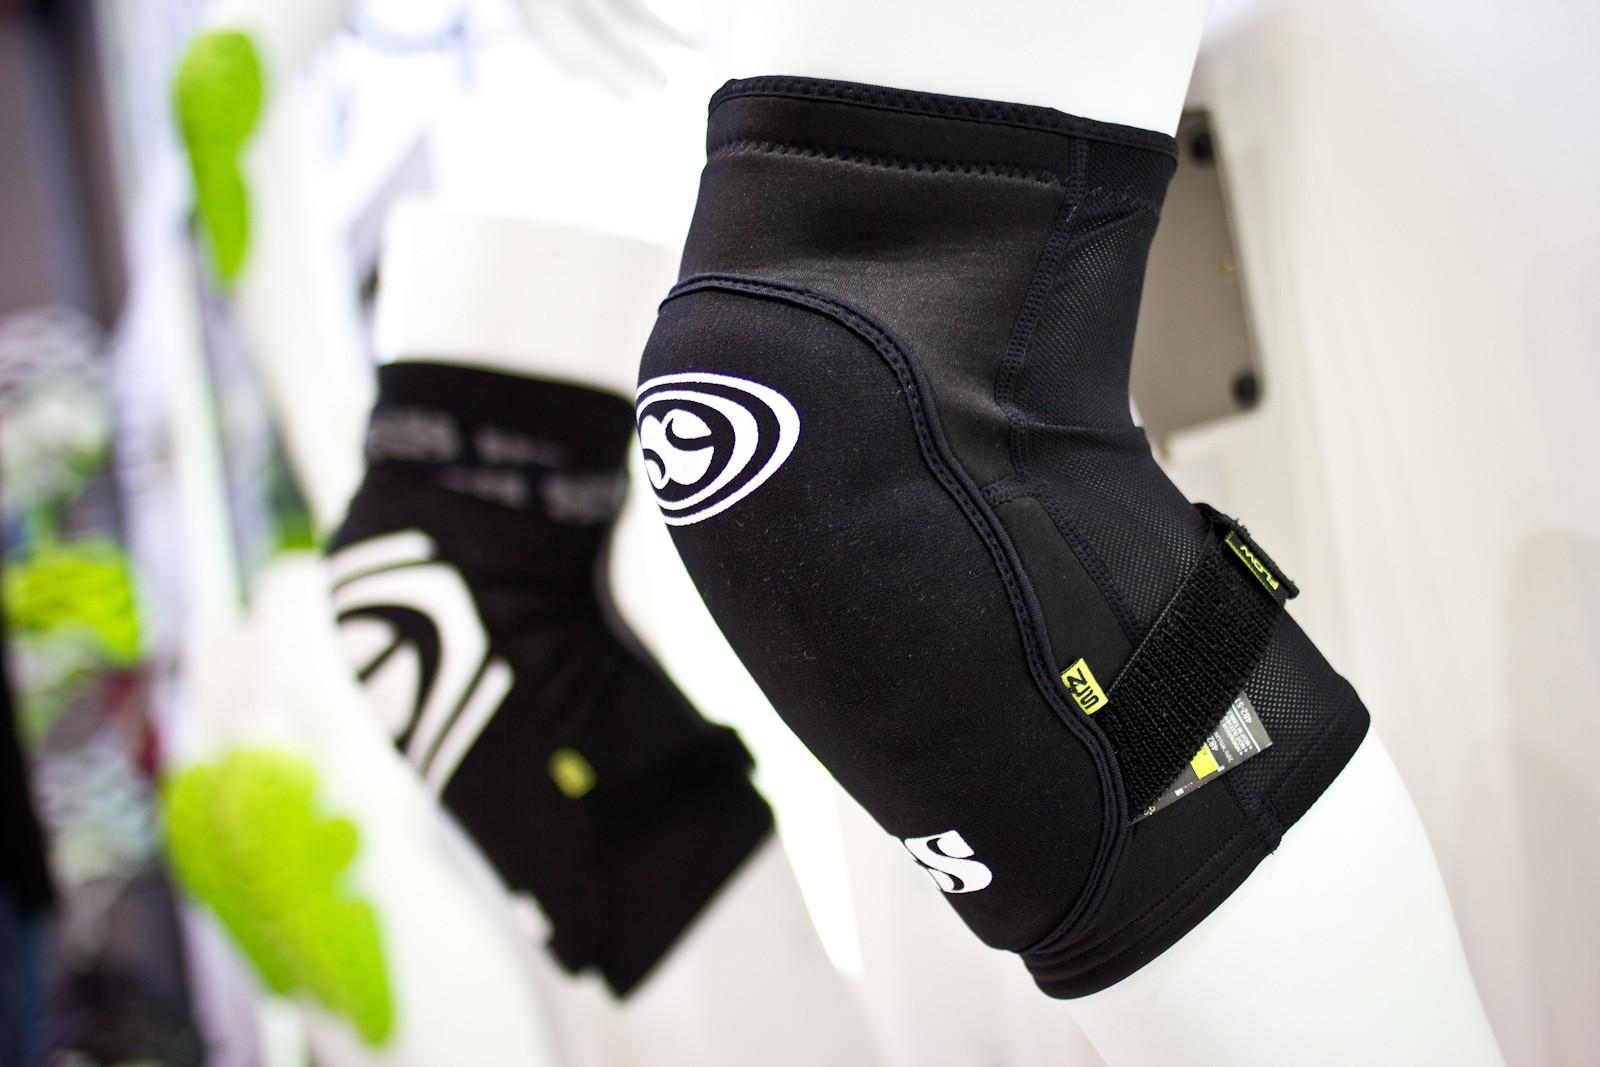 iXS Flow Series Knee Pads - 2014 Mountain Bike Apparel & Protection at Eurobike 2013 - Mountain Biking Pictures - Vital MTB